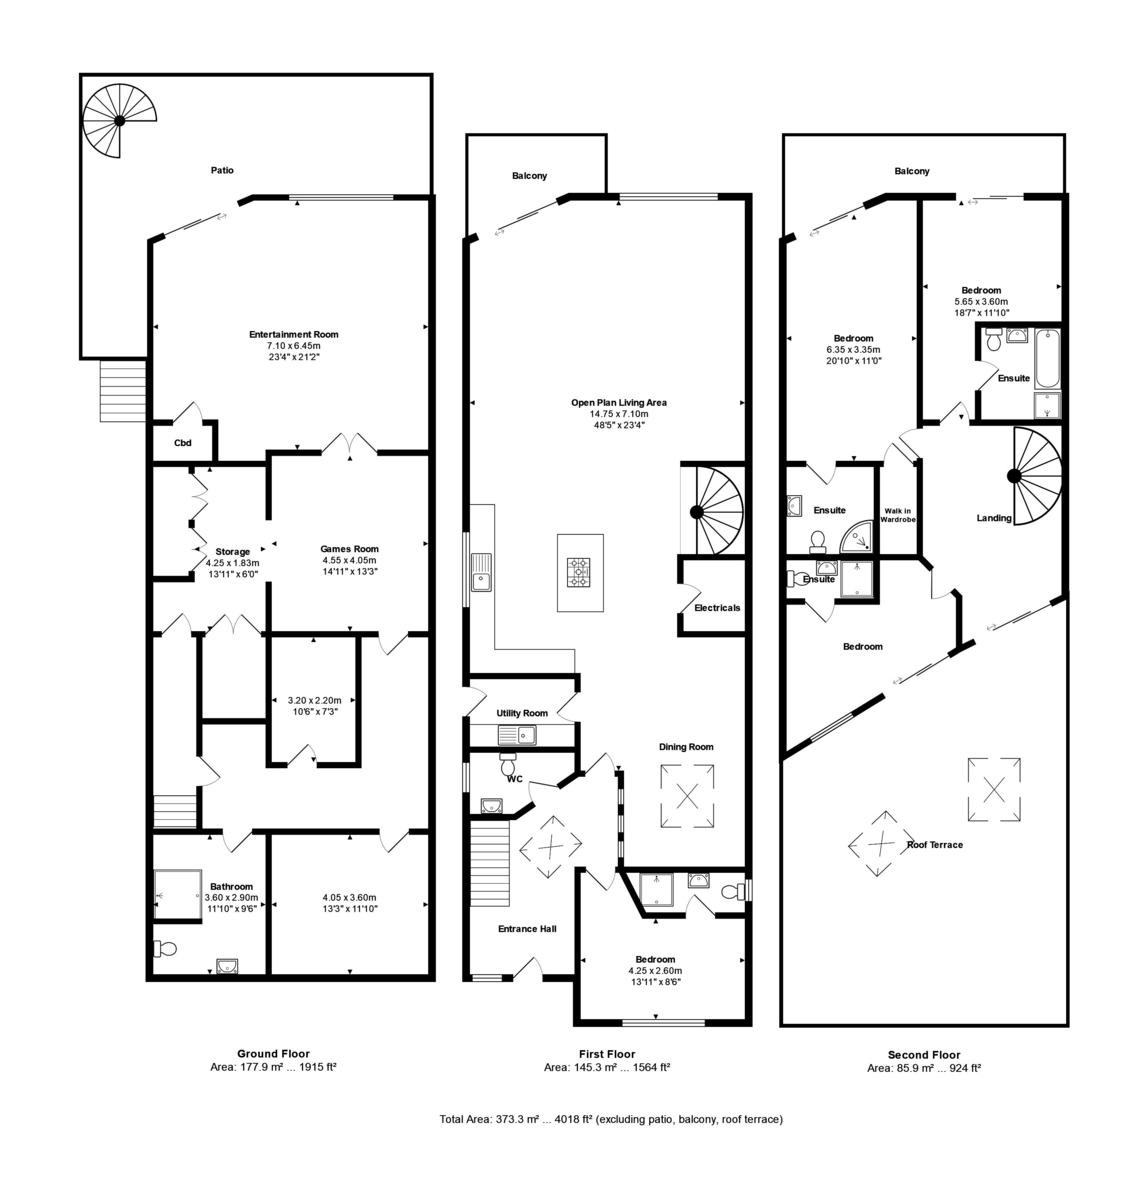 Willow Way, Christchurch, Dorset, BH23 1JJ floorplan